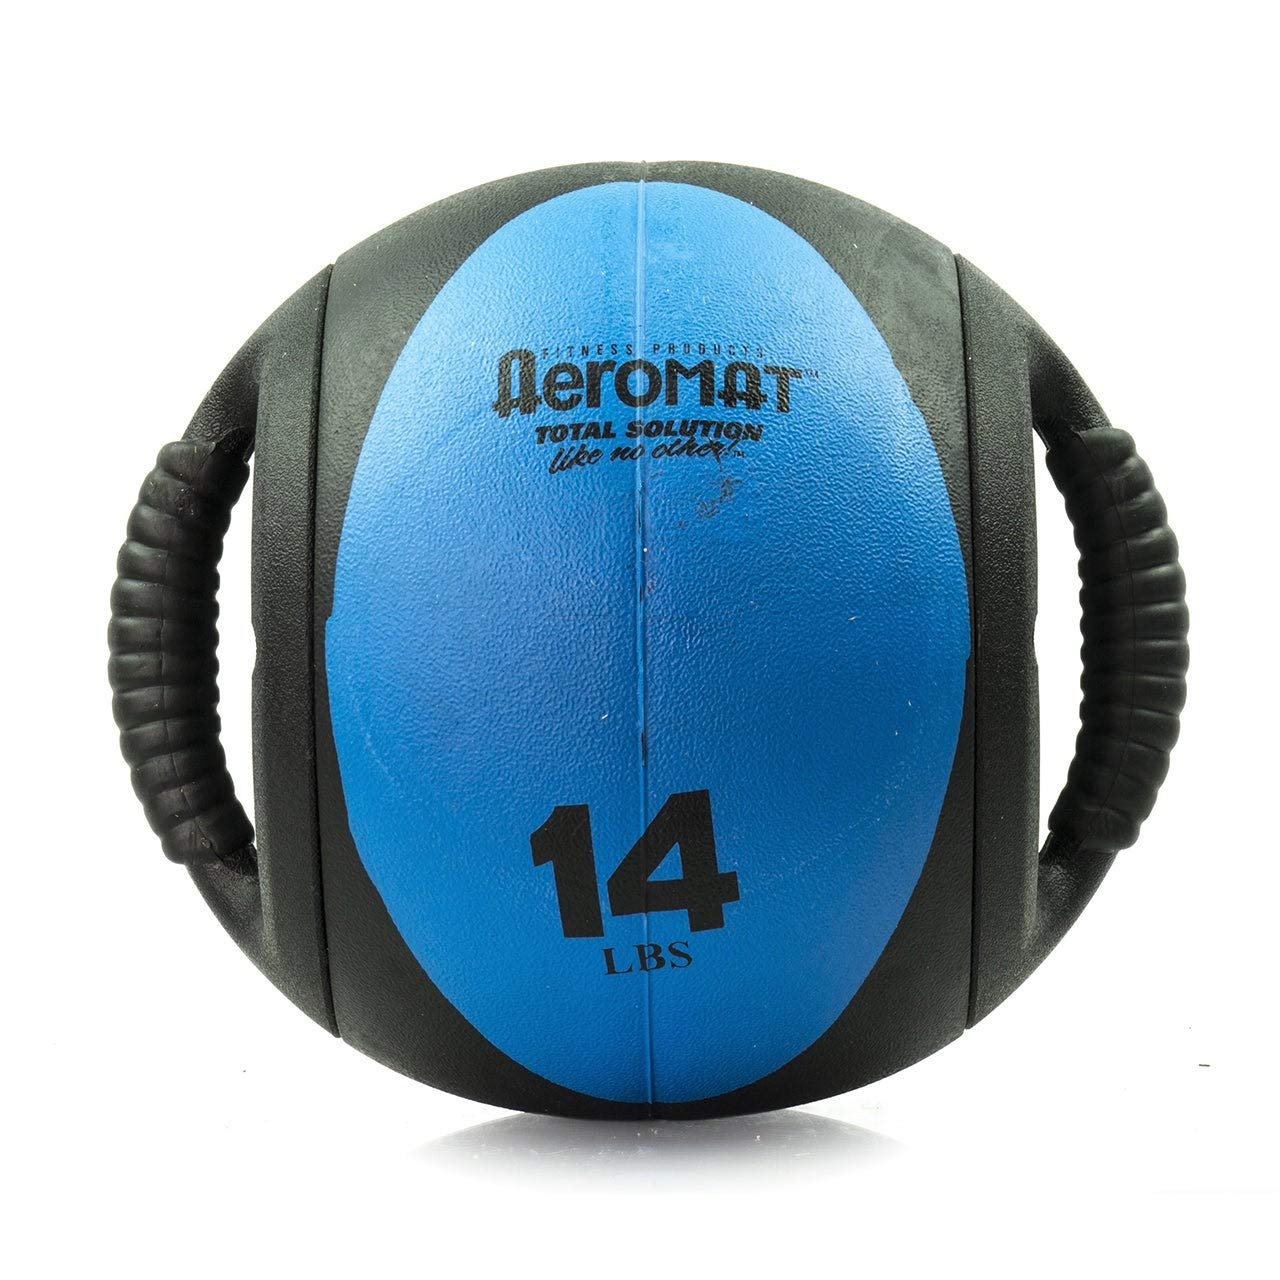 Aeromat Dual Grip Power Medicine Ball, 9cm/14-Pound, Black/Blue